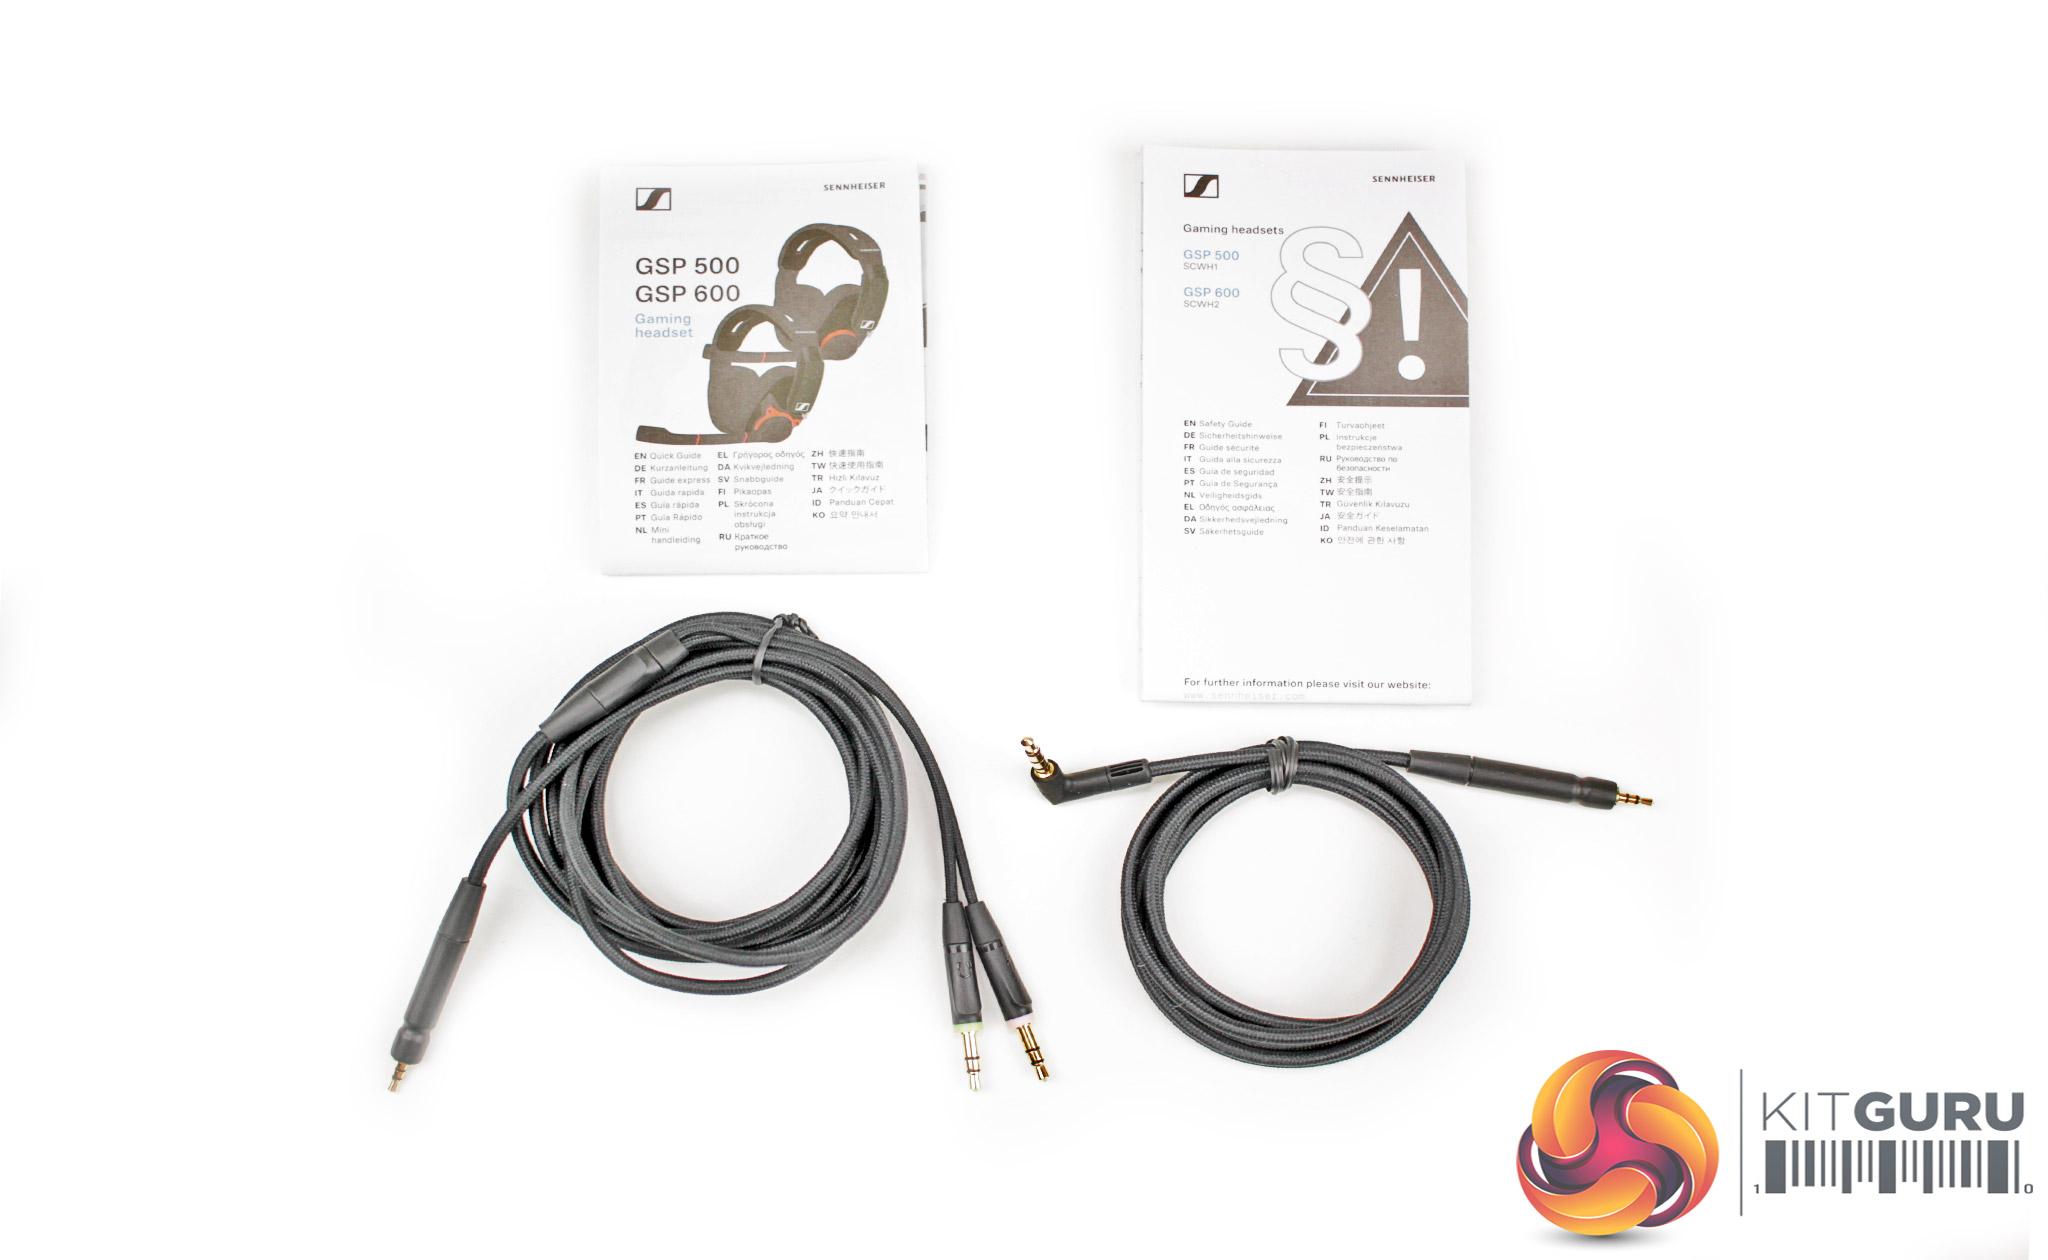 Sennheiser Gsp 600 Headset Review